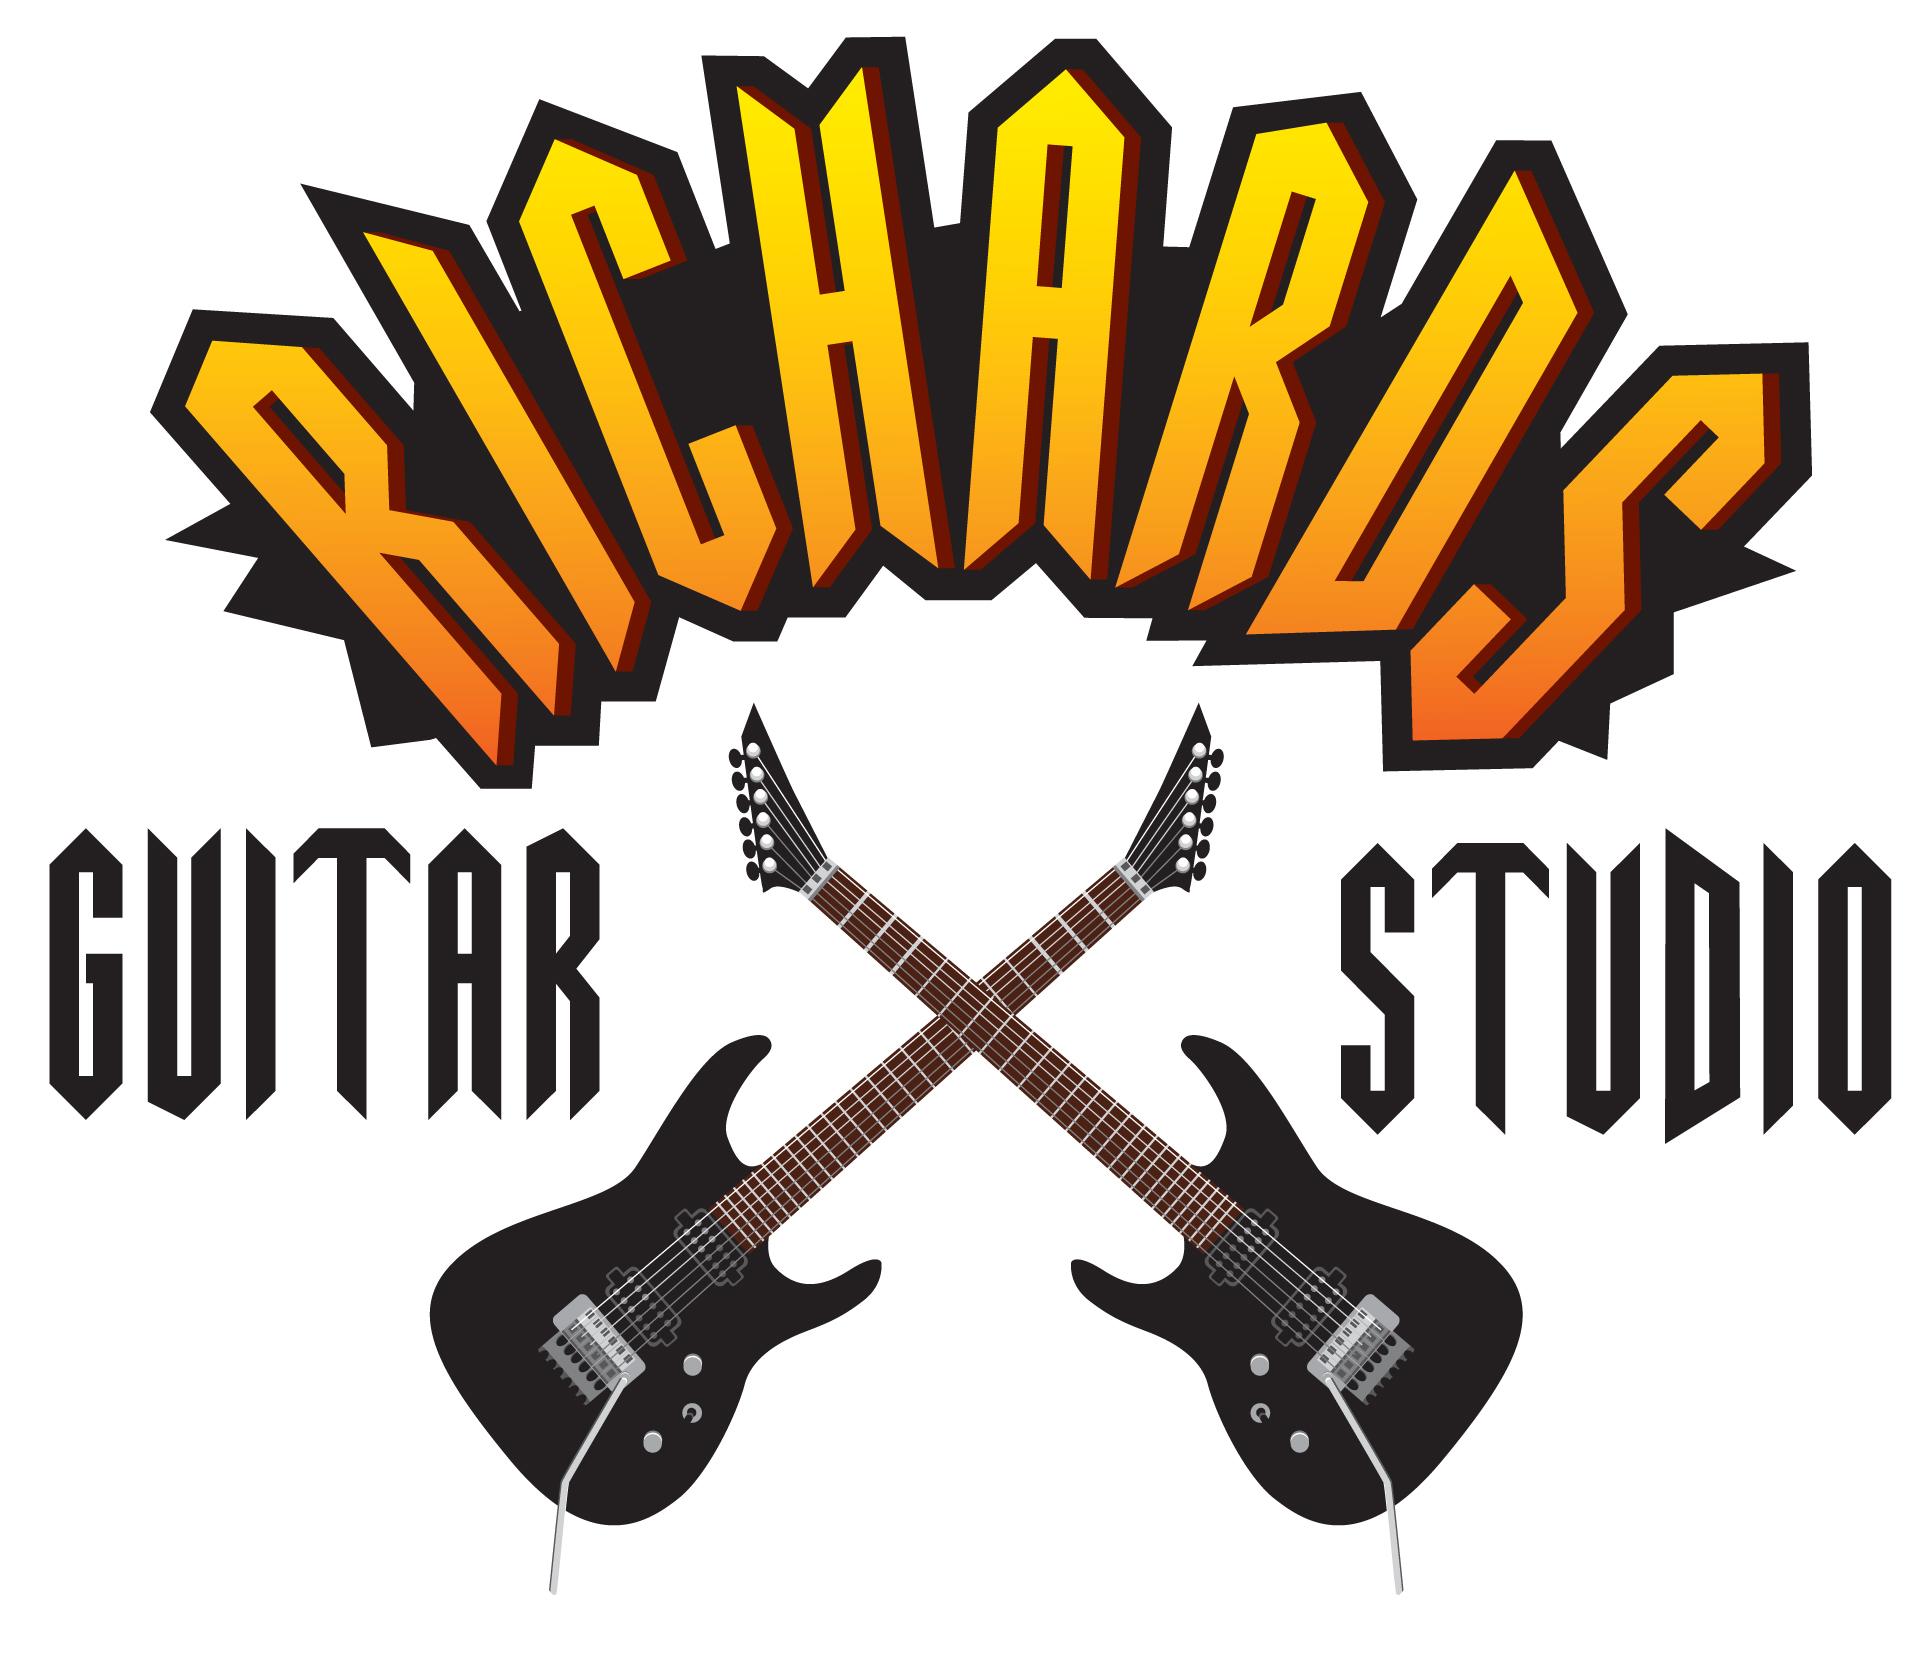 RichardsGuitarStudio_FINAL